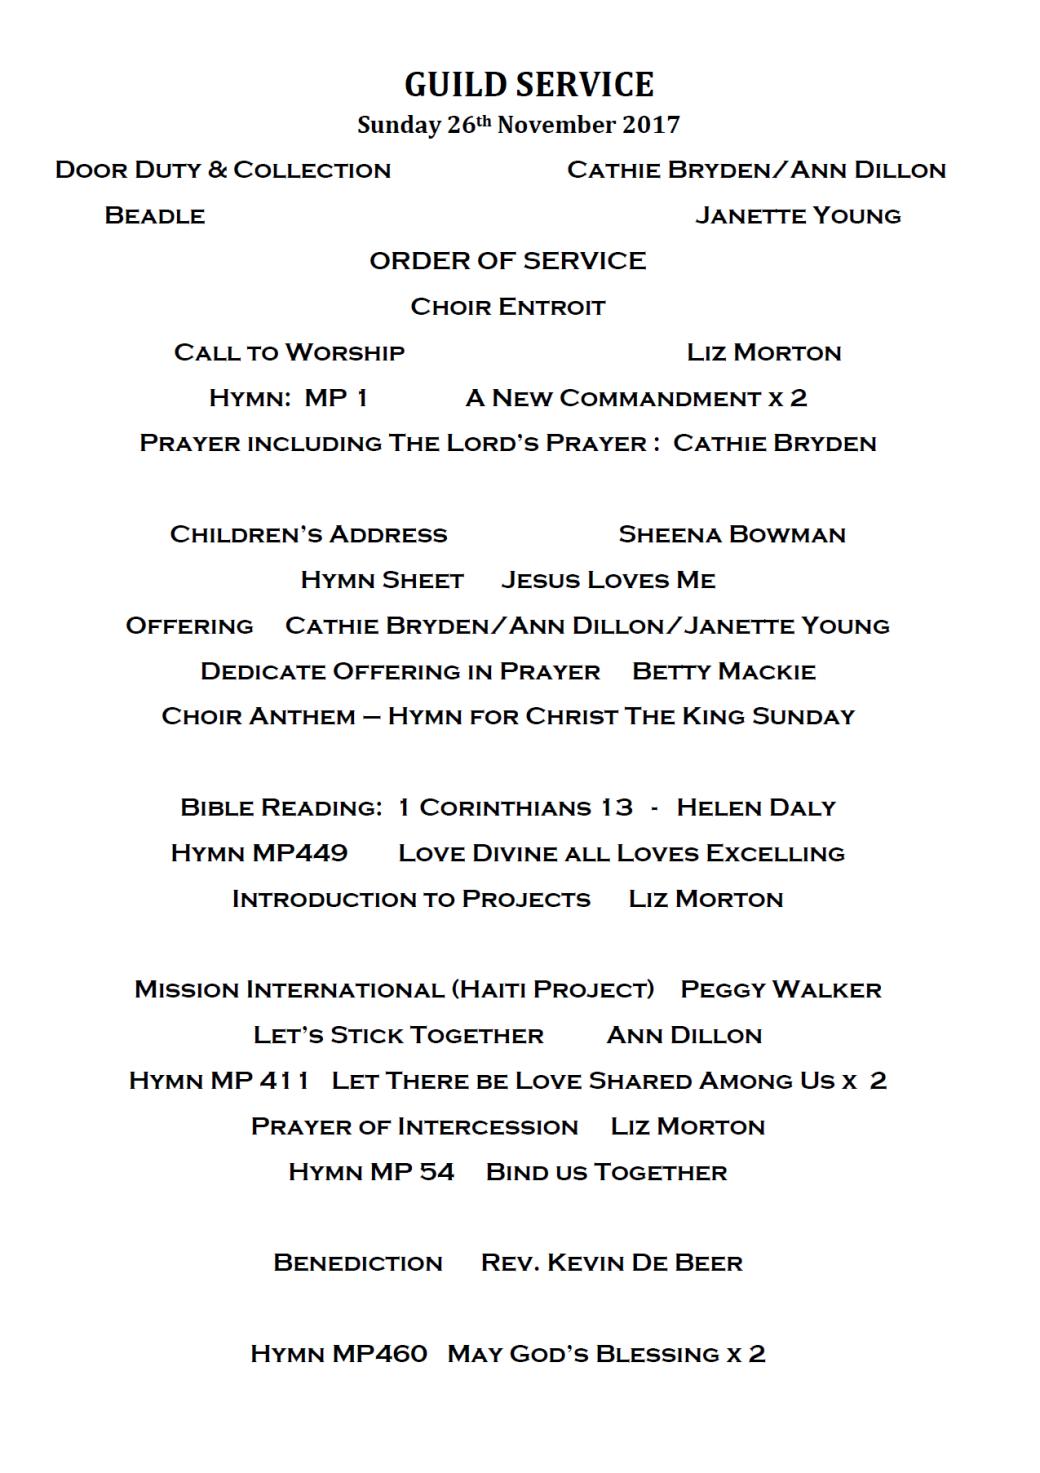 guild service 26 11 17